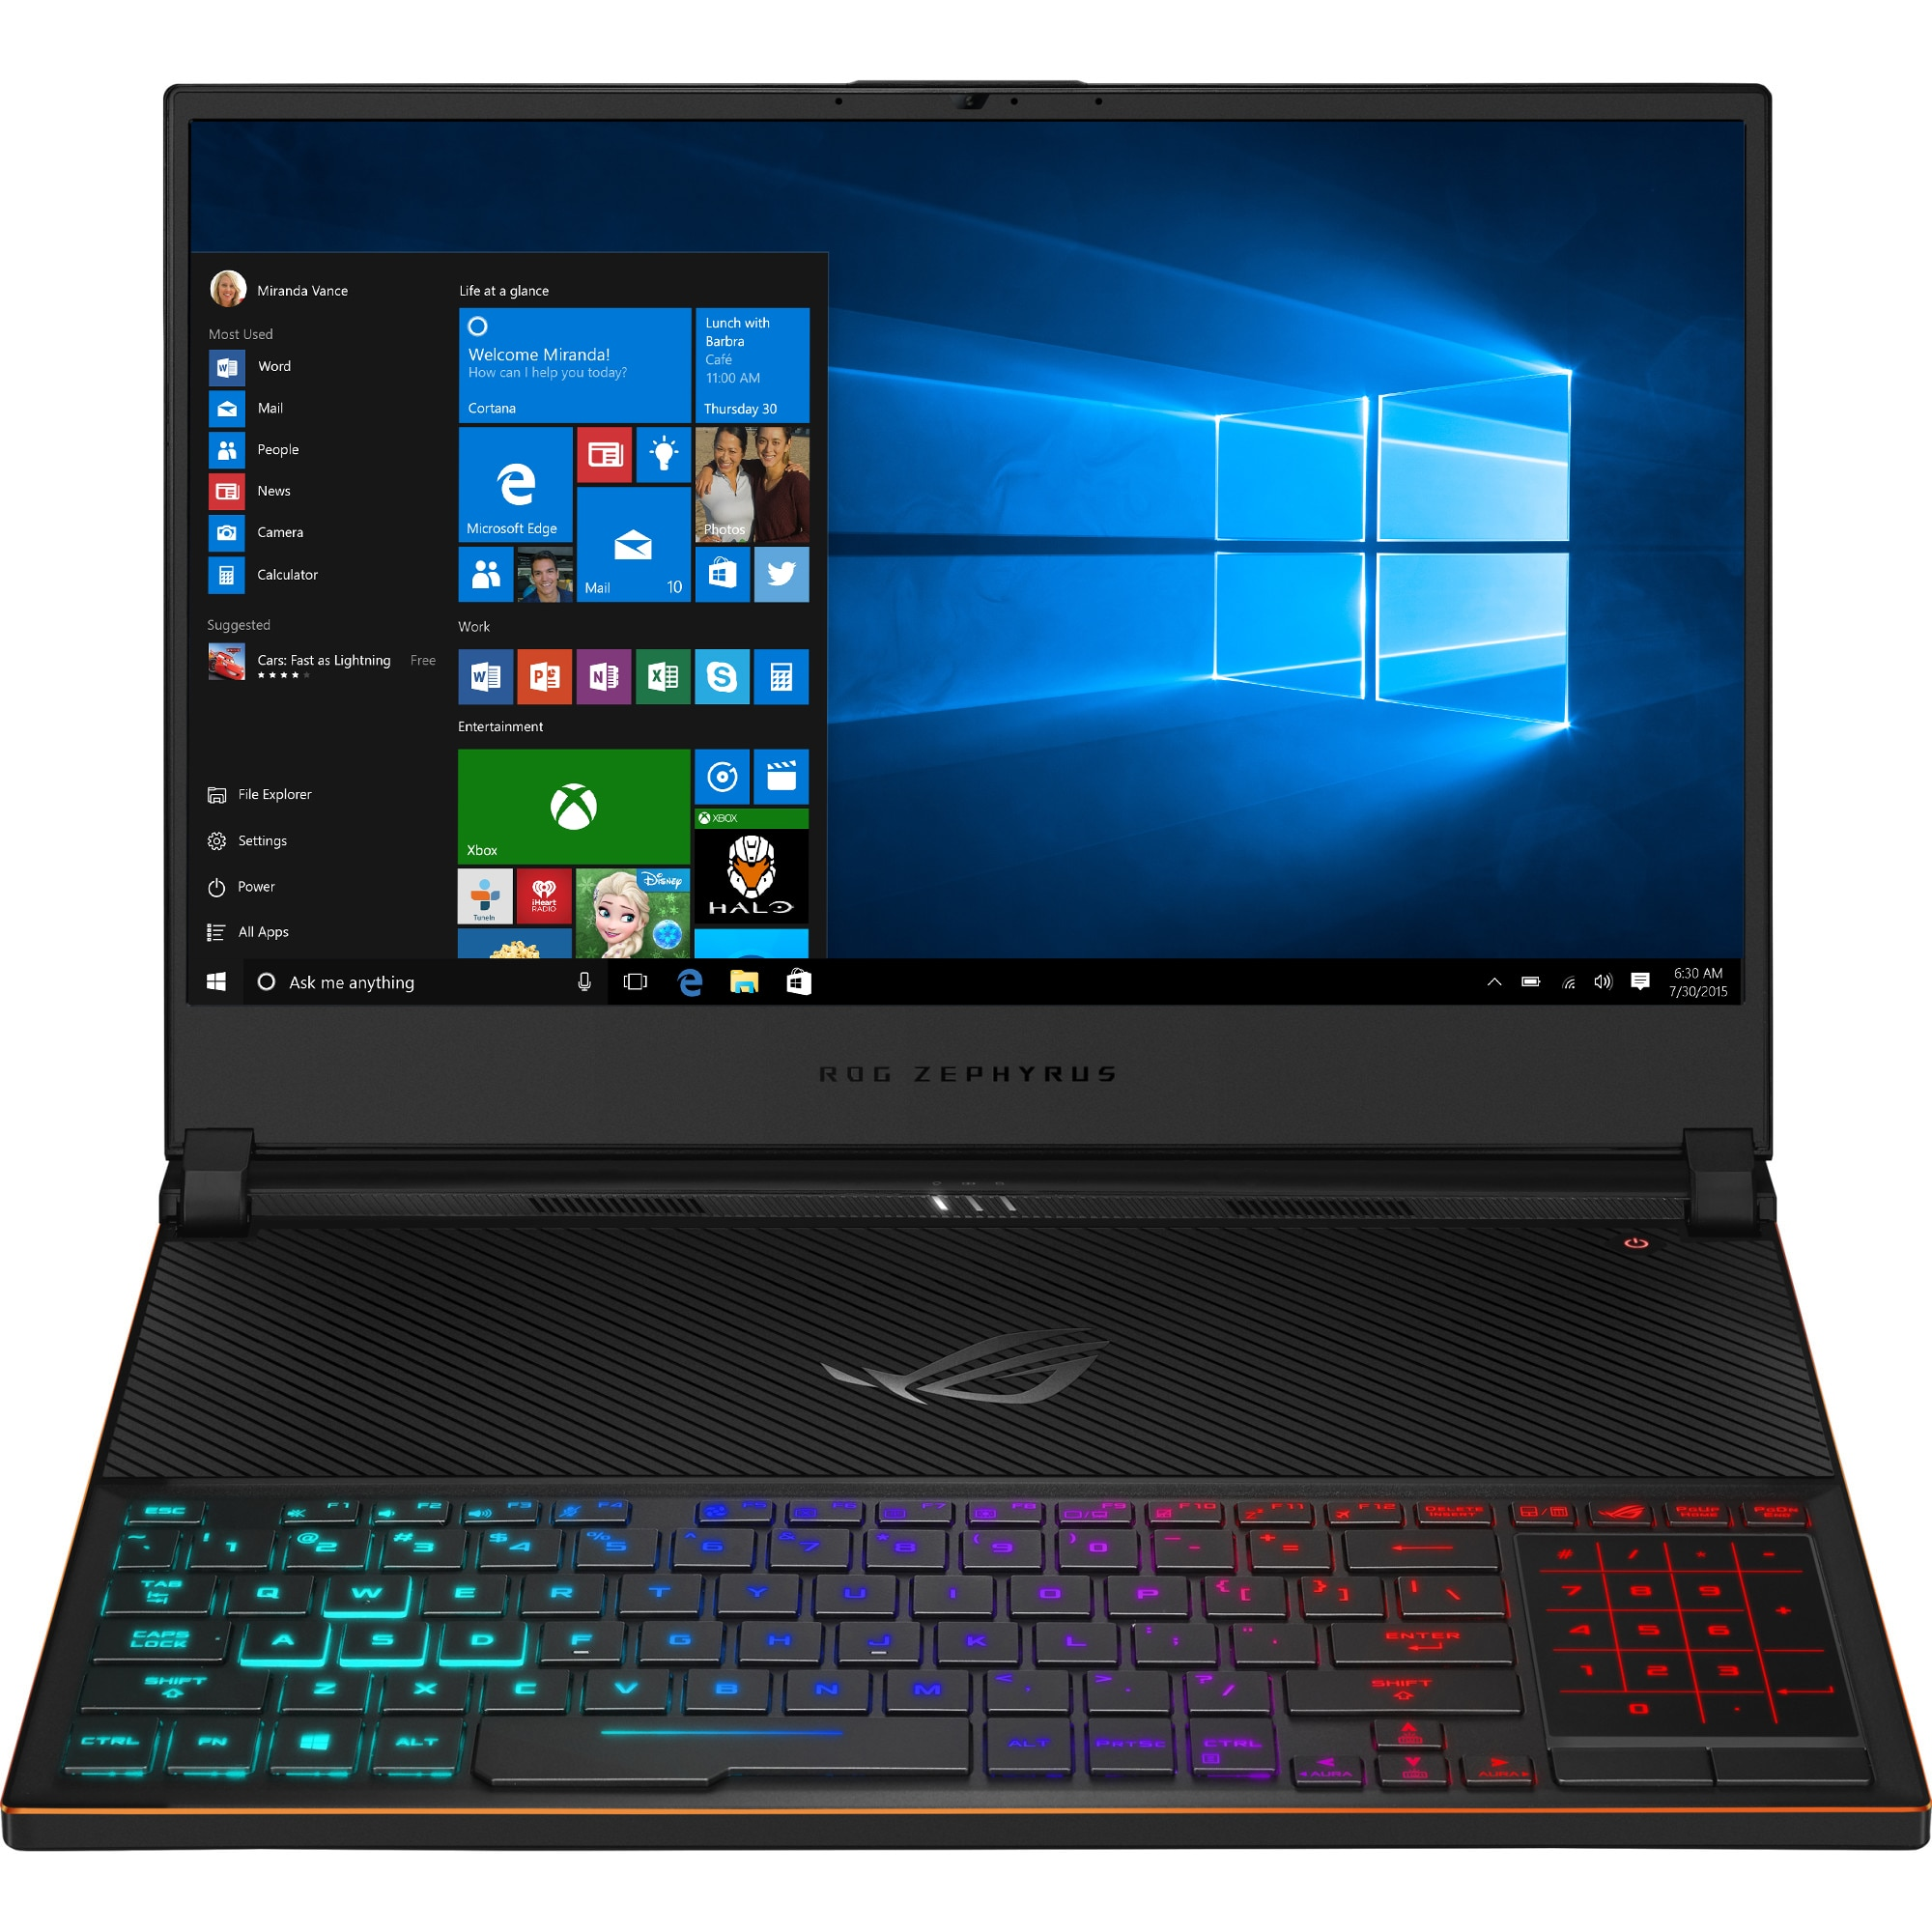 "Fotografie Laptop Gaming ASUS ROG Zephyrus S GX531GX cu procesor Intel® Core™ i7-8750H pana la 4.10 GHz, Coffee Lake, 15.6"", Full HD, IPS, 144Hz, 16GB, 512GB SSD, NVIDIA GeForce RTX 2080 Max-Q 8GB, Microsoft Windows 10 Pro, Black Aluminum"